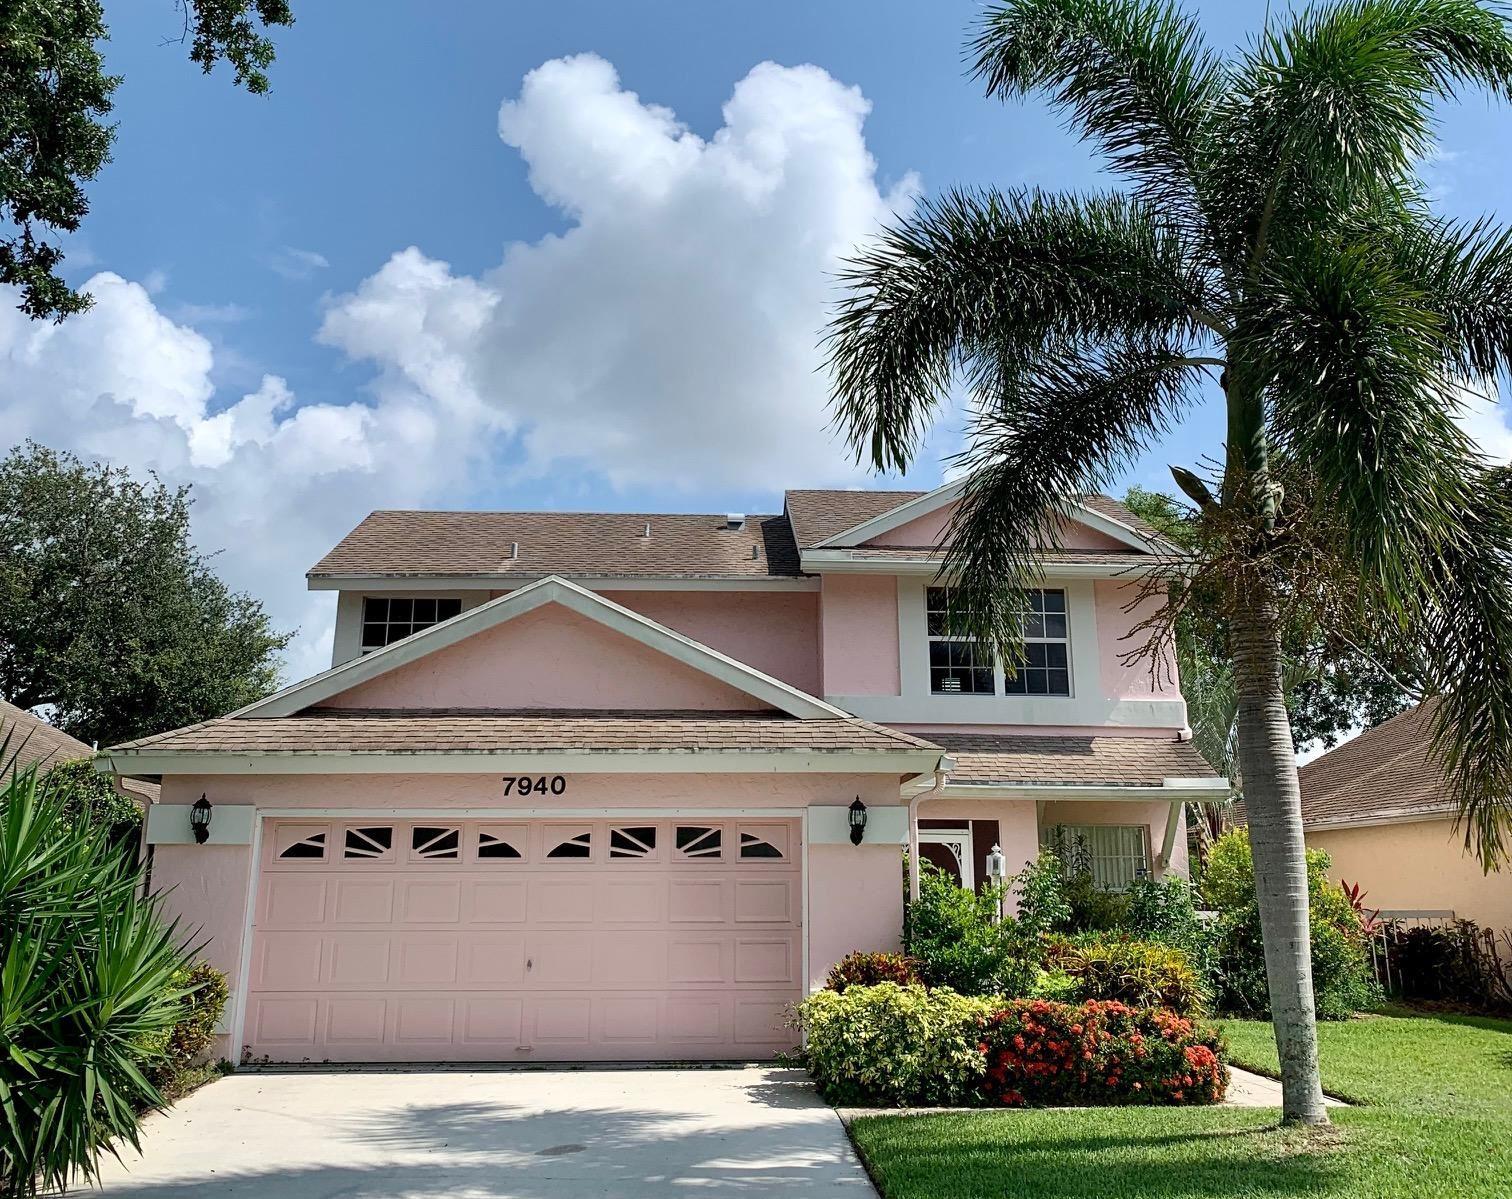 7940 Mansfield Hollow Road, Delray Beach, FL 33446 - #: RX-10730833